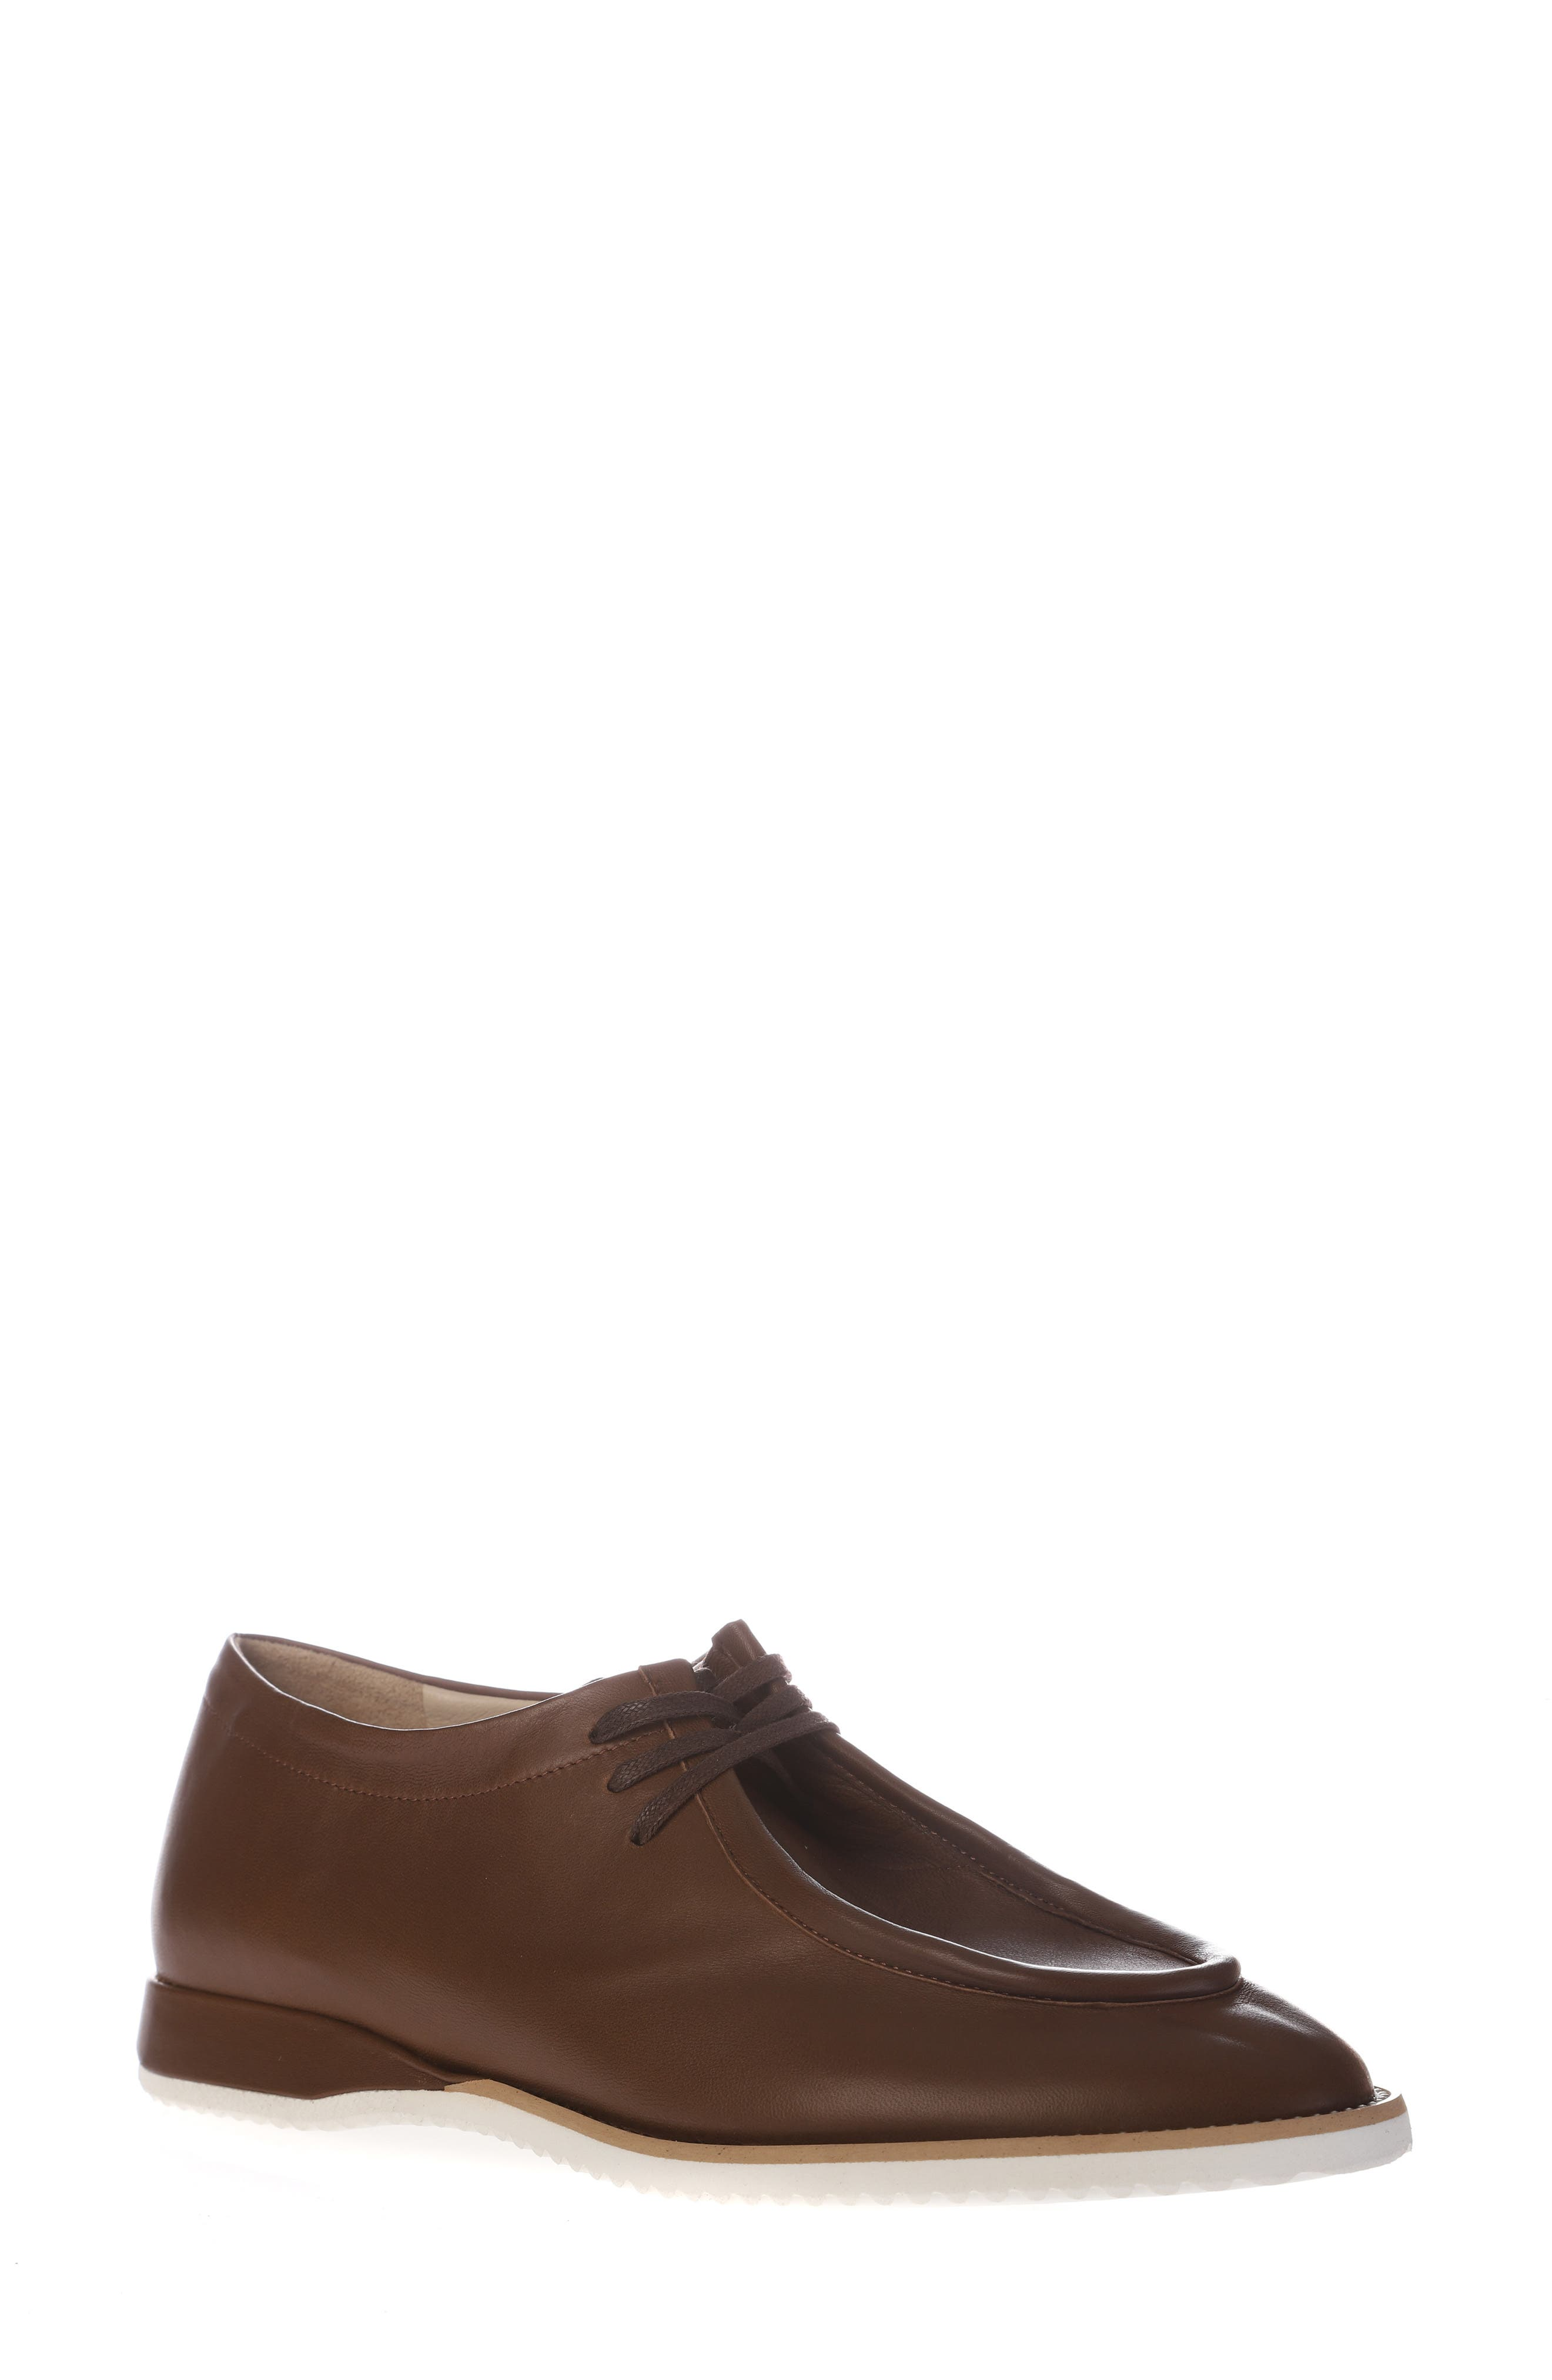 Edy Chukka Shoe